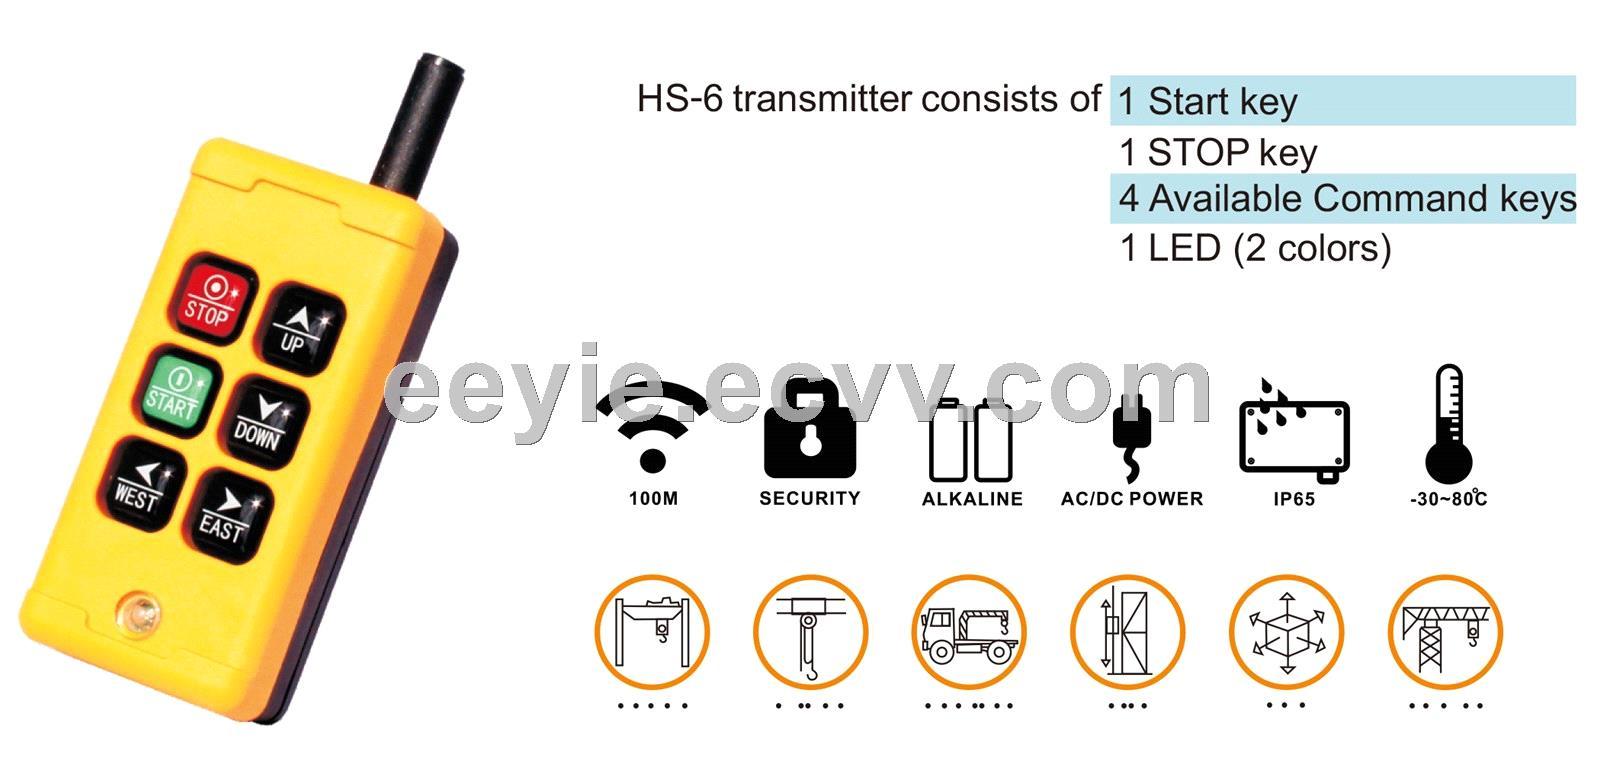 crane wireless remote control switch crane transmitter